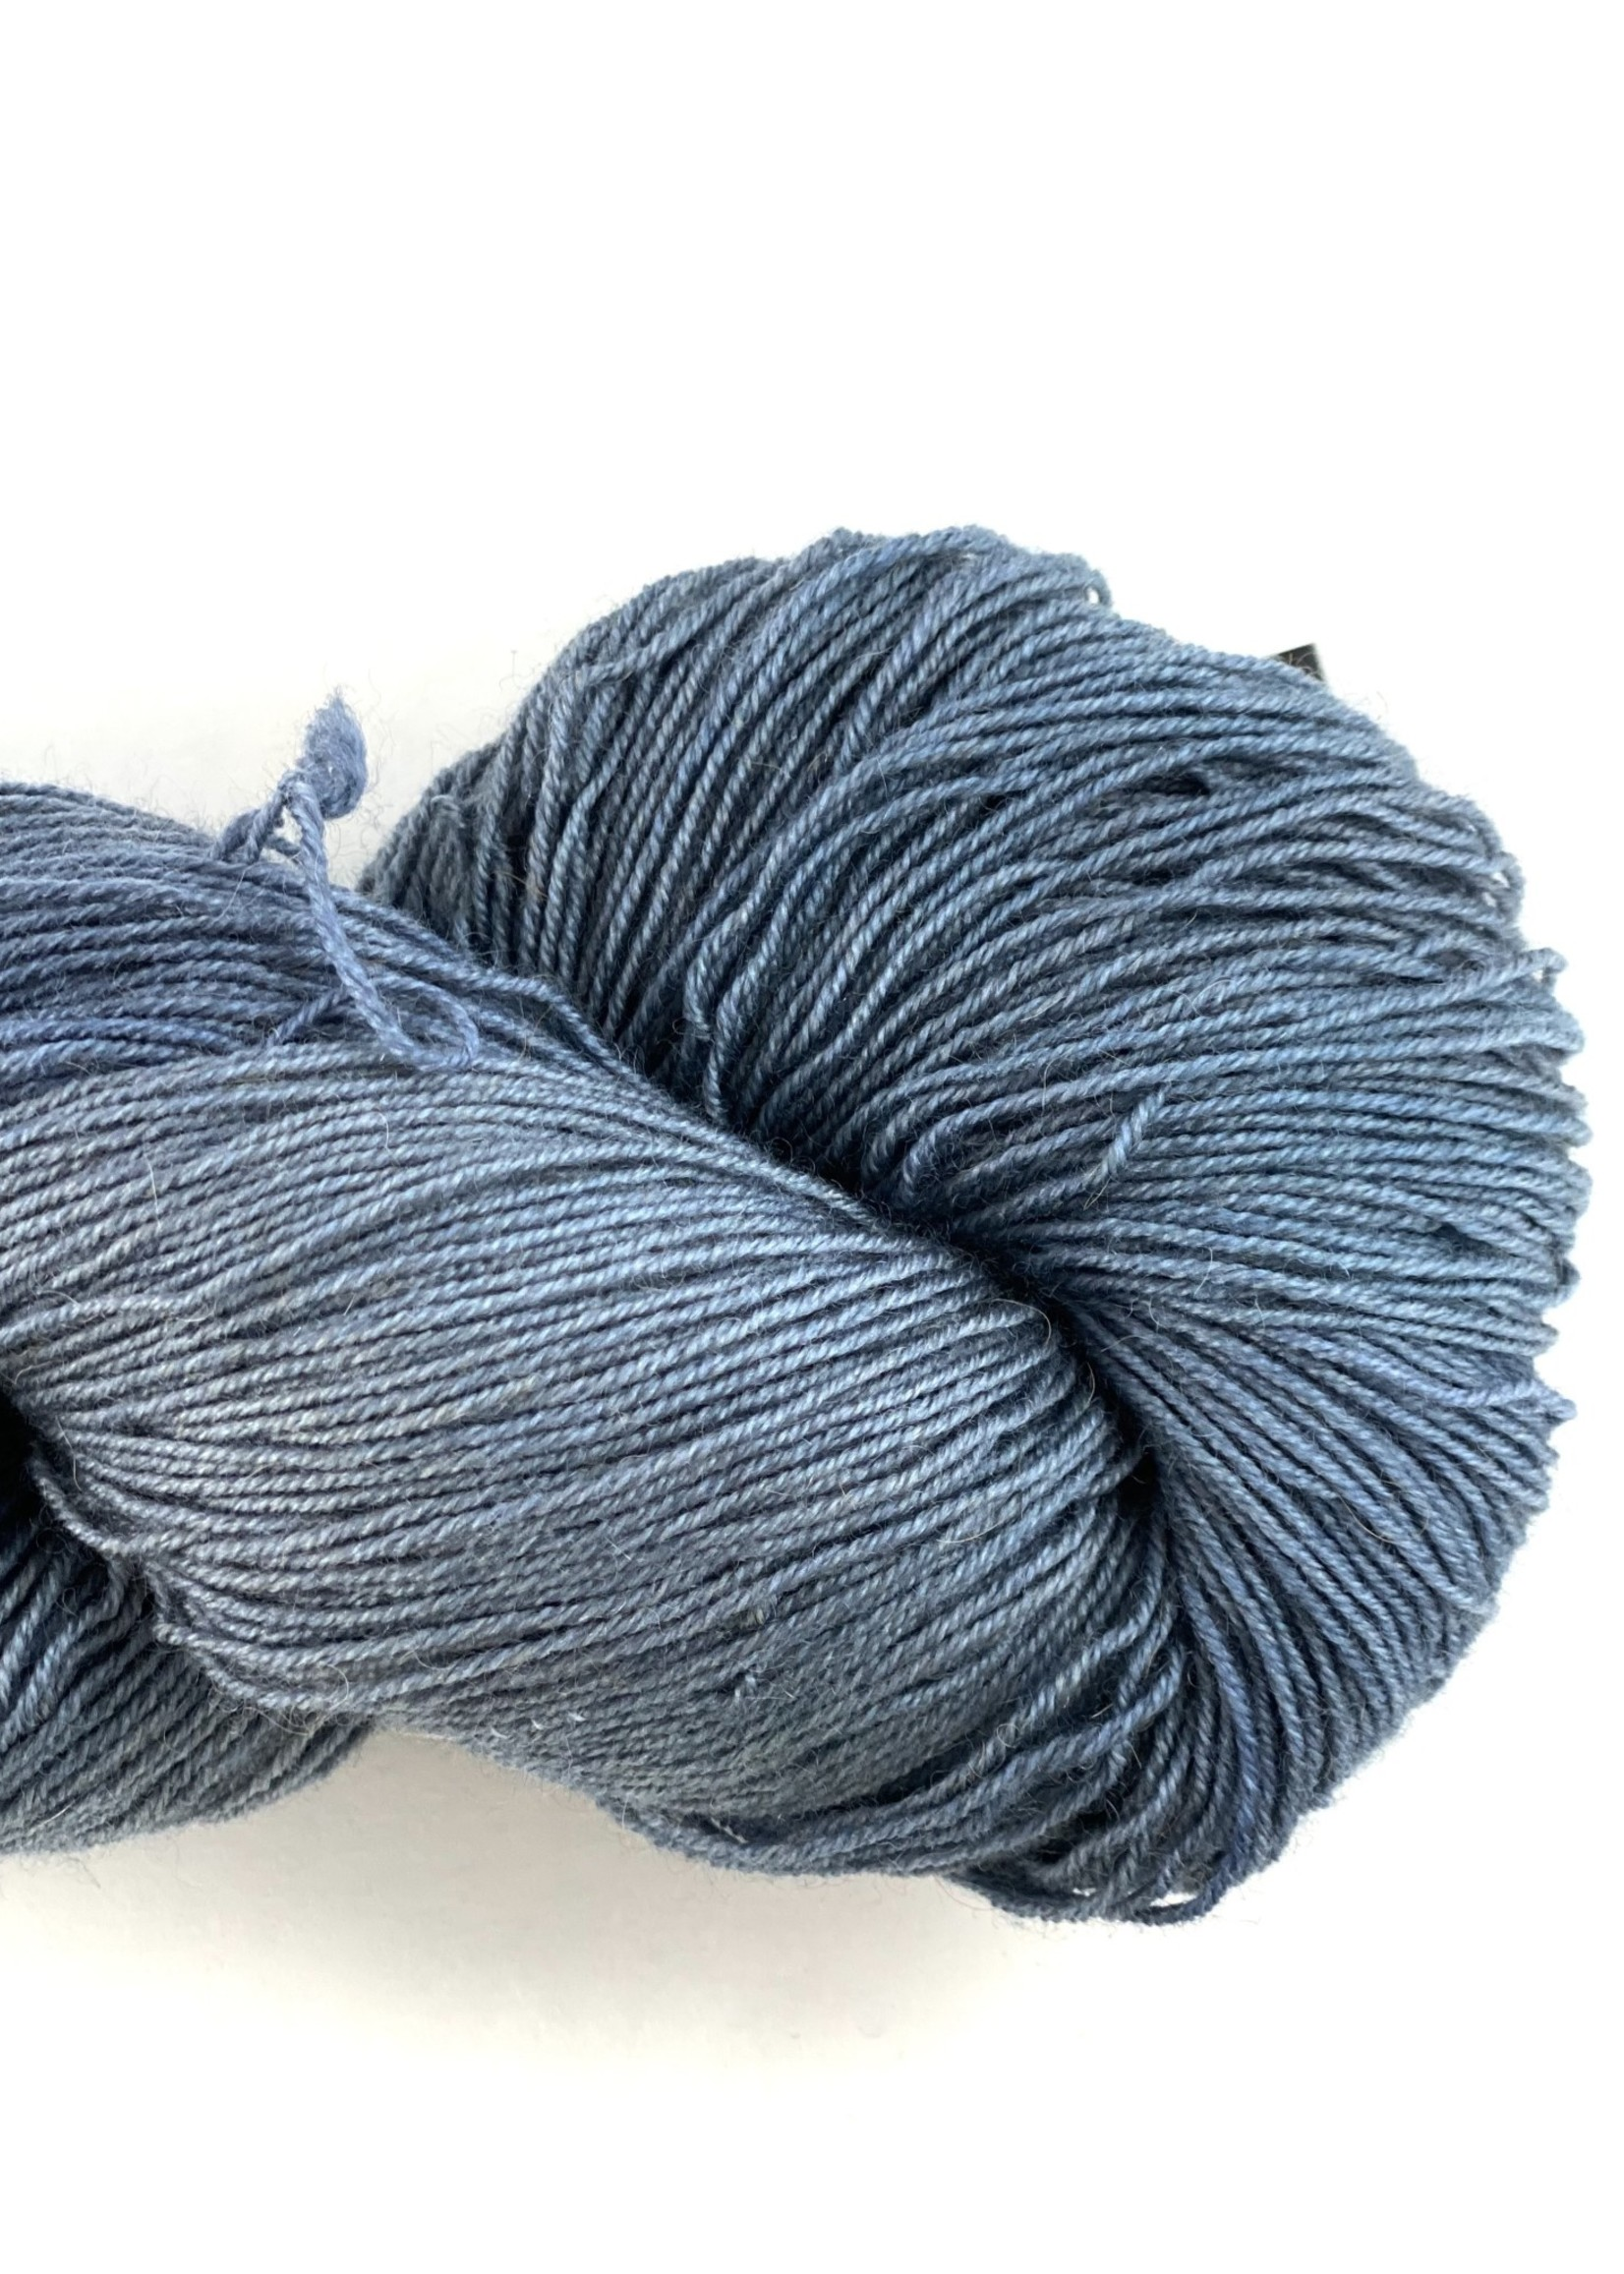 Handmaiden Fine Yarn Hand Maiden Merino Camel Lace Yarn Stardust